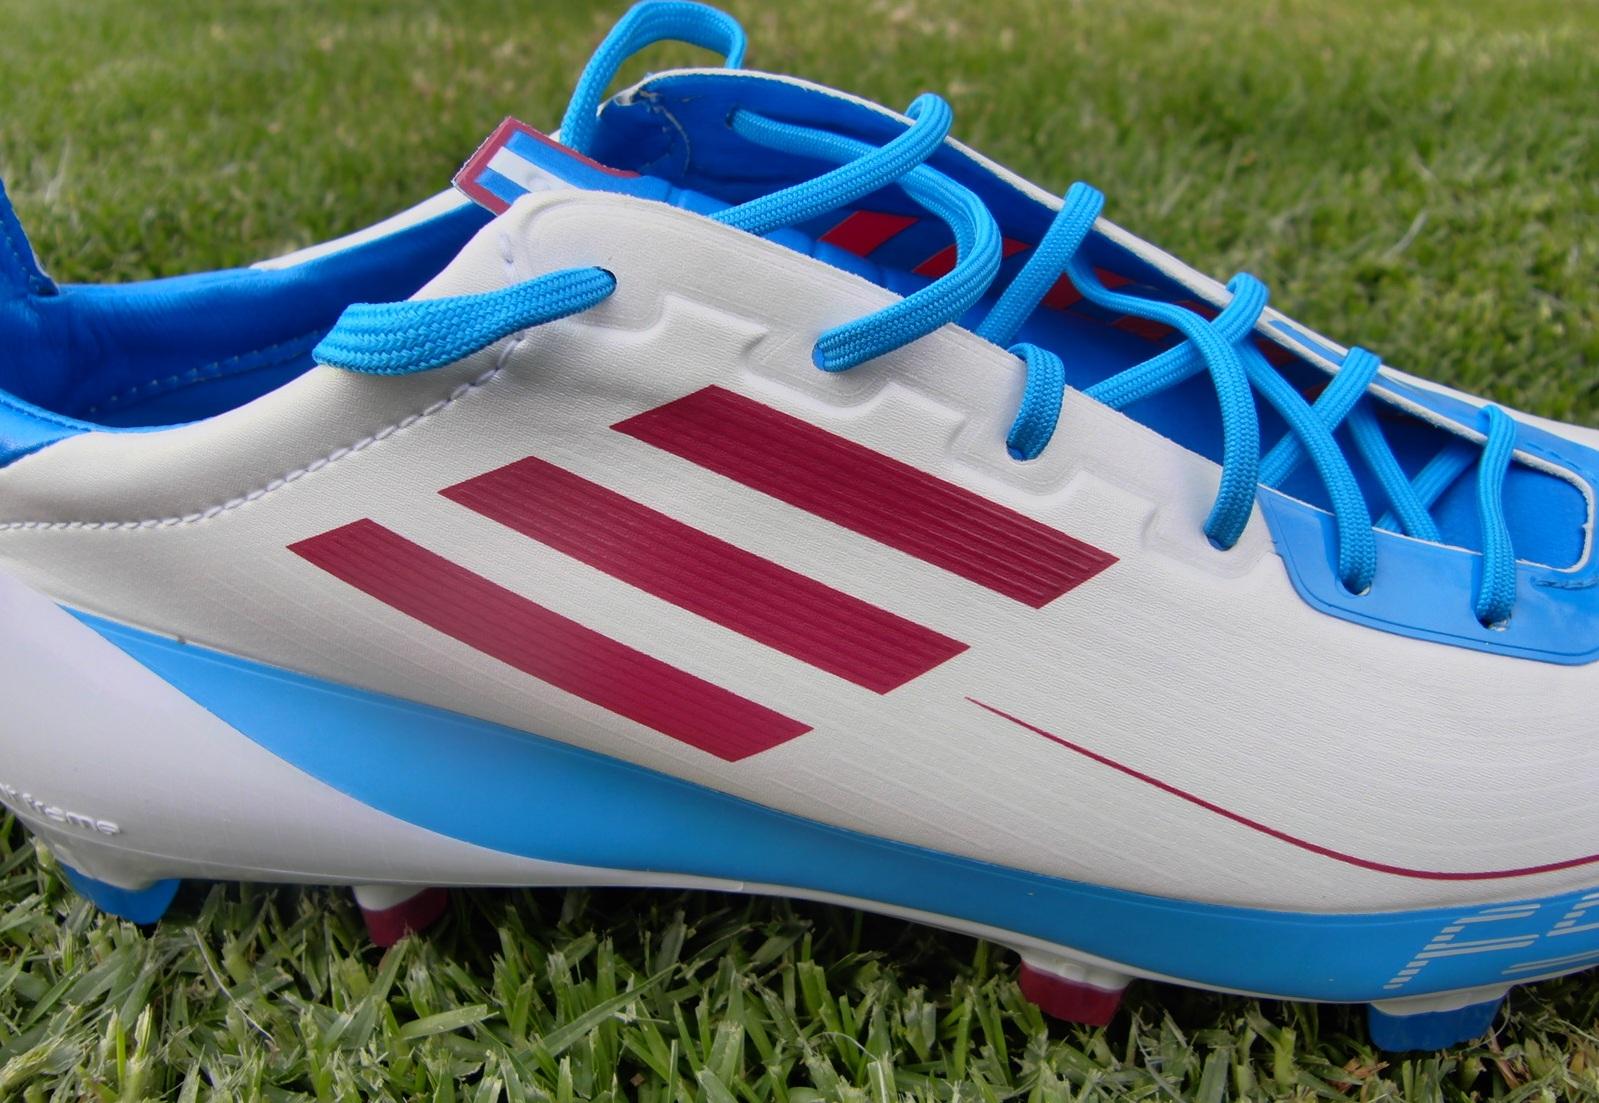 Adidas F50 adiZero Prime Review   Soccer Cleats 101